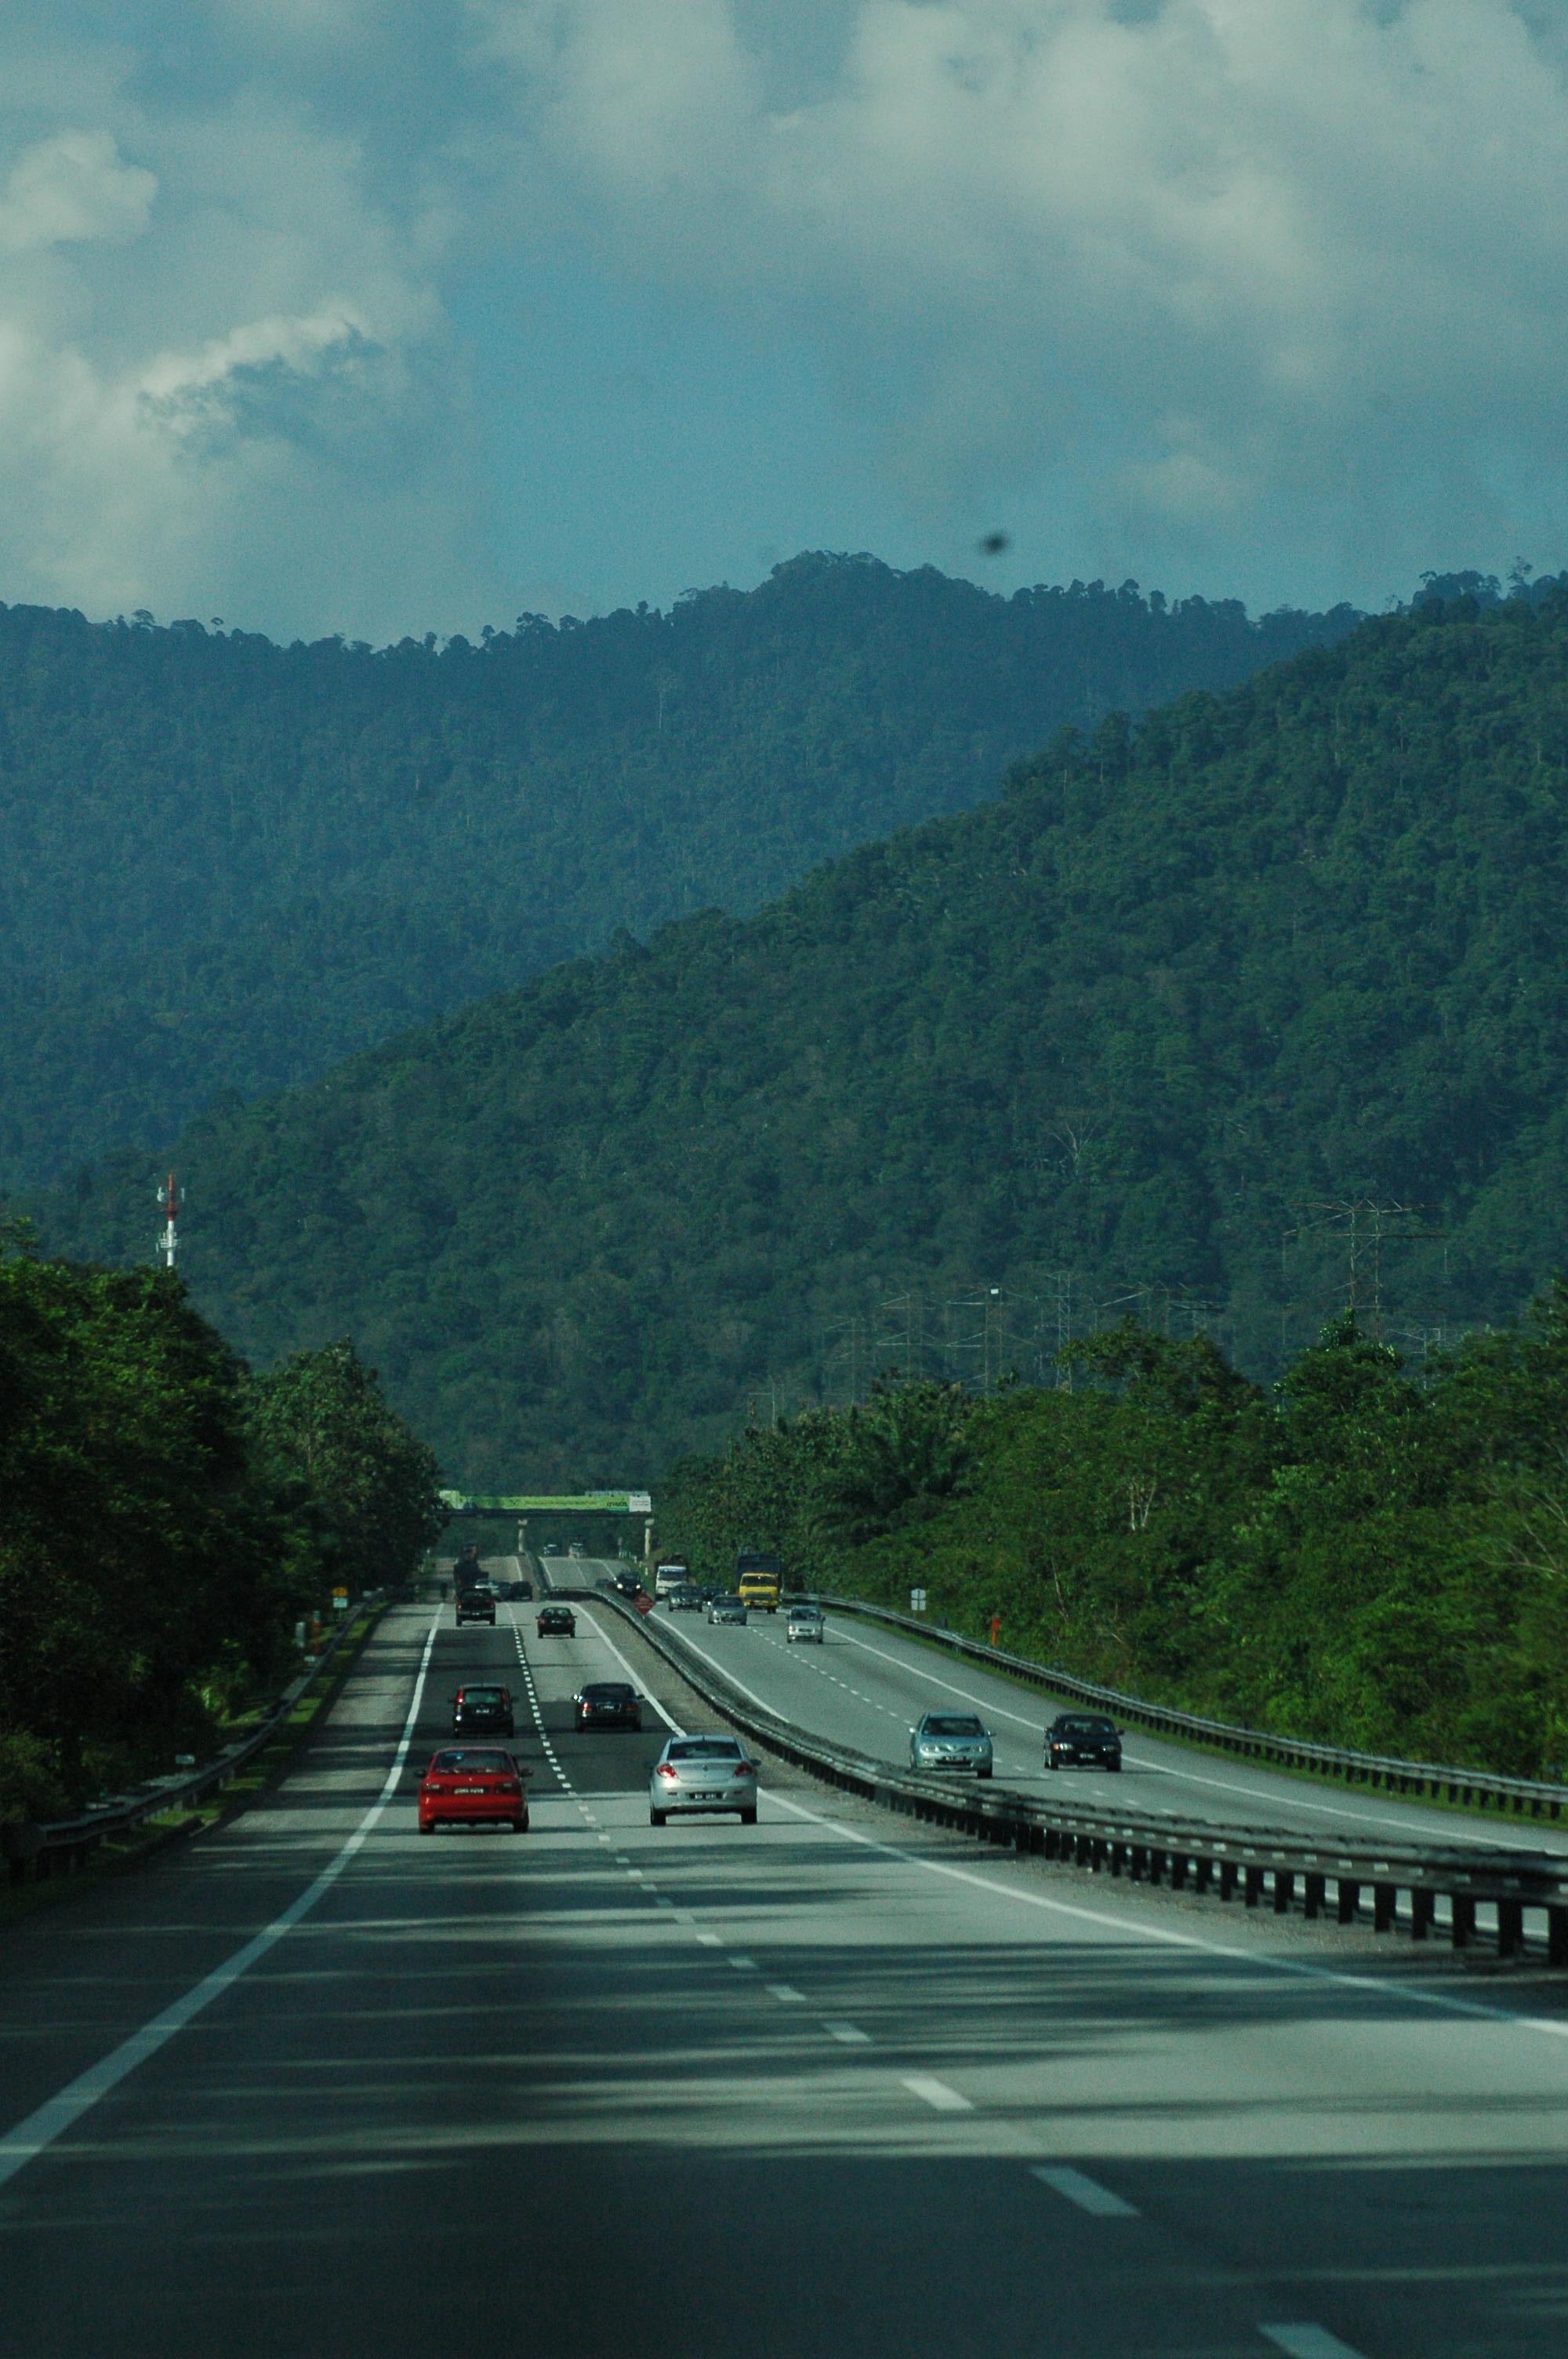 North-South Expressway